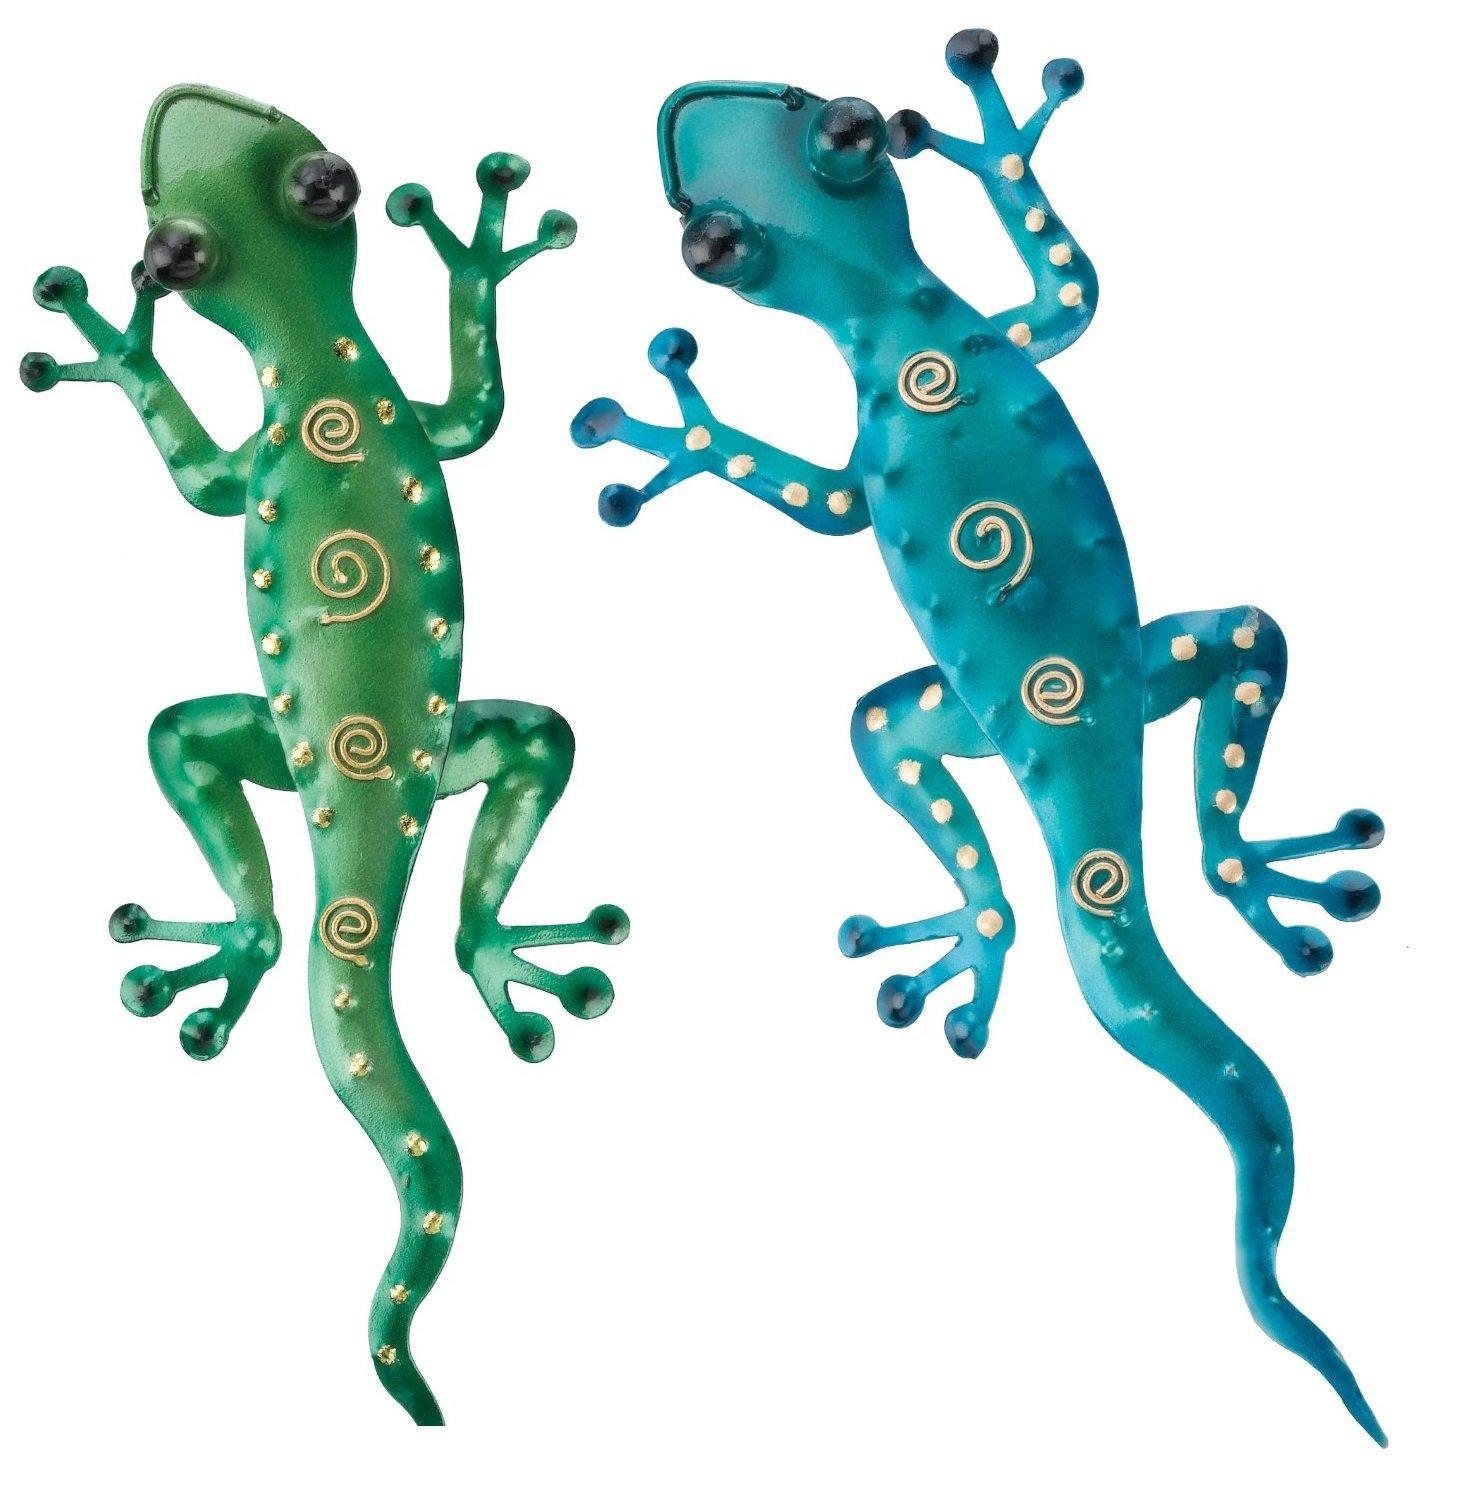 Outdoor Wall Decor Gecko : Gecko wall decor ideas metal art